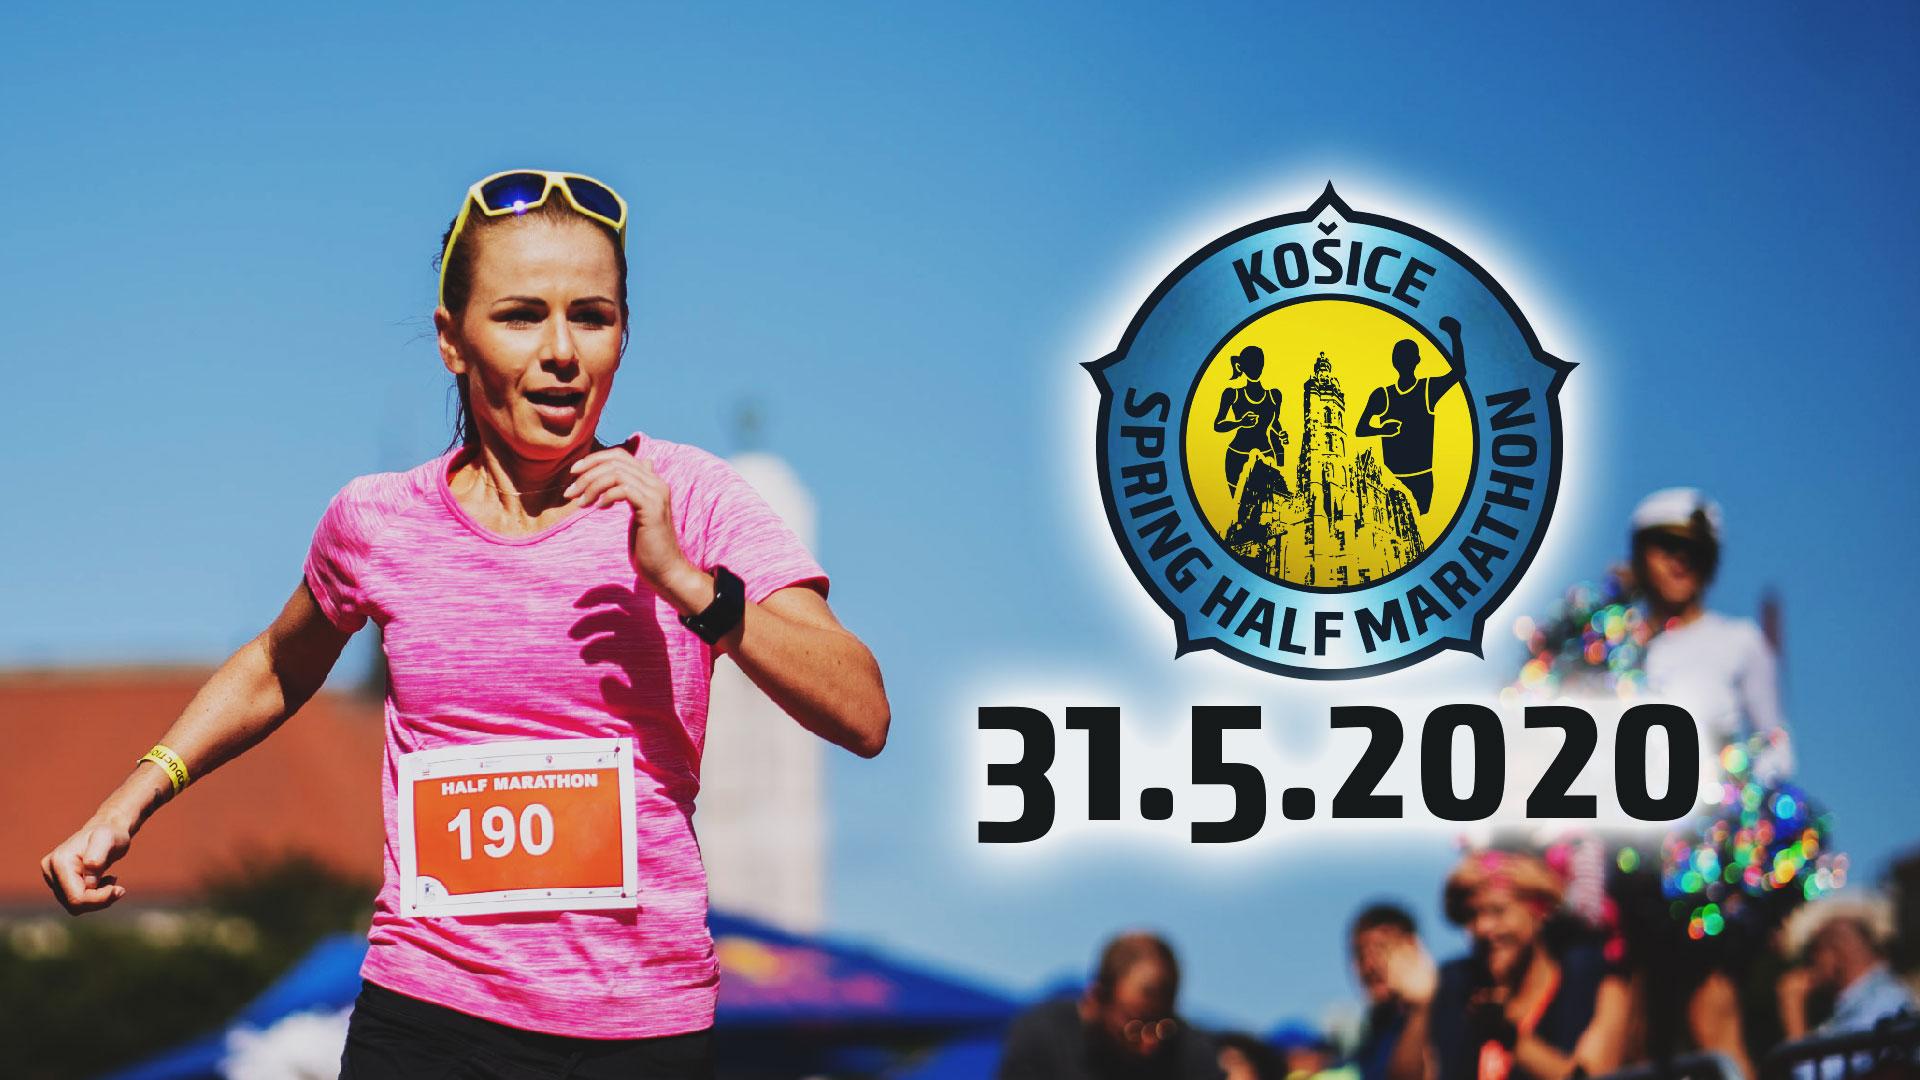 Košice Spring Half Marathon